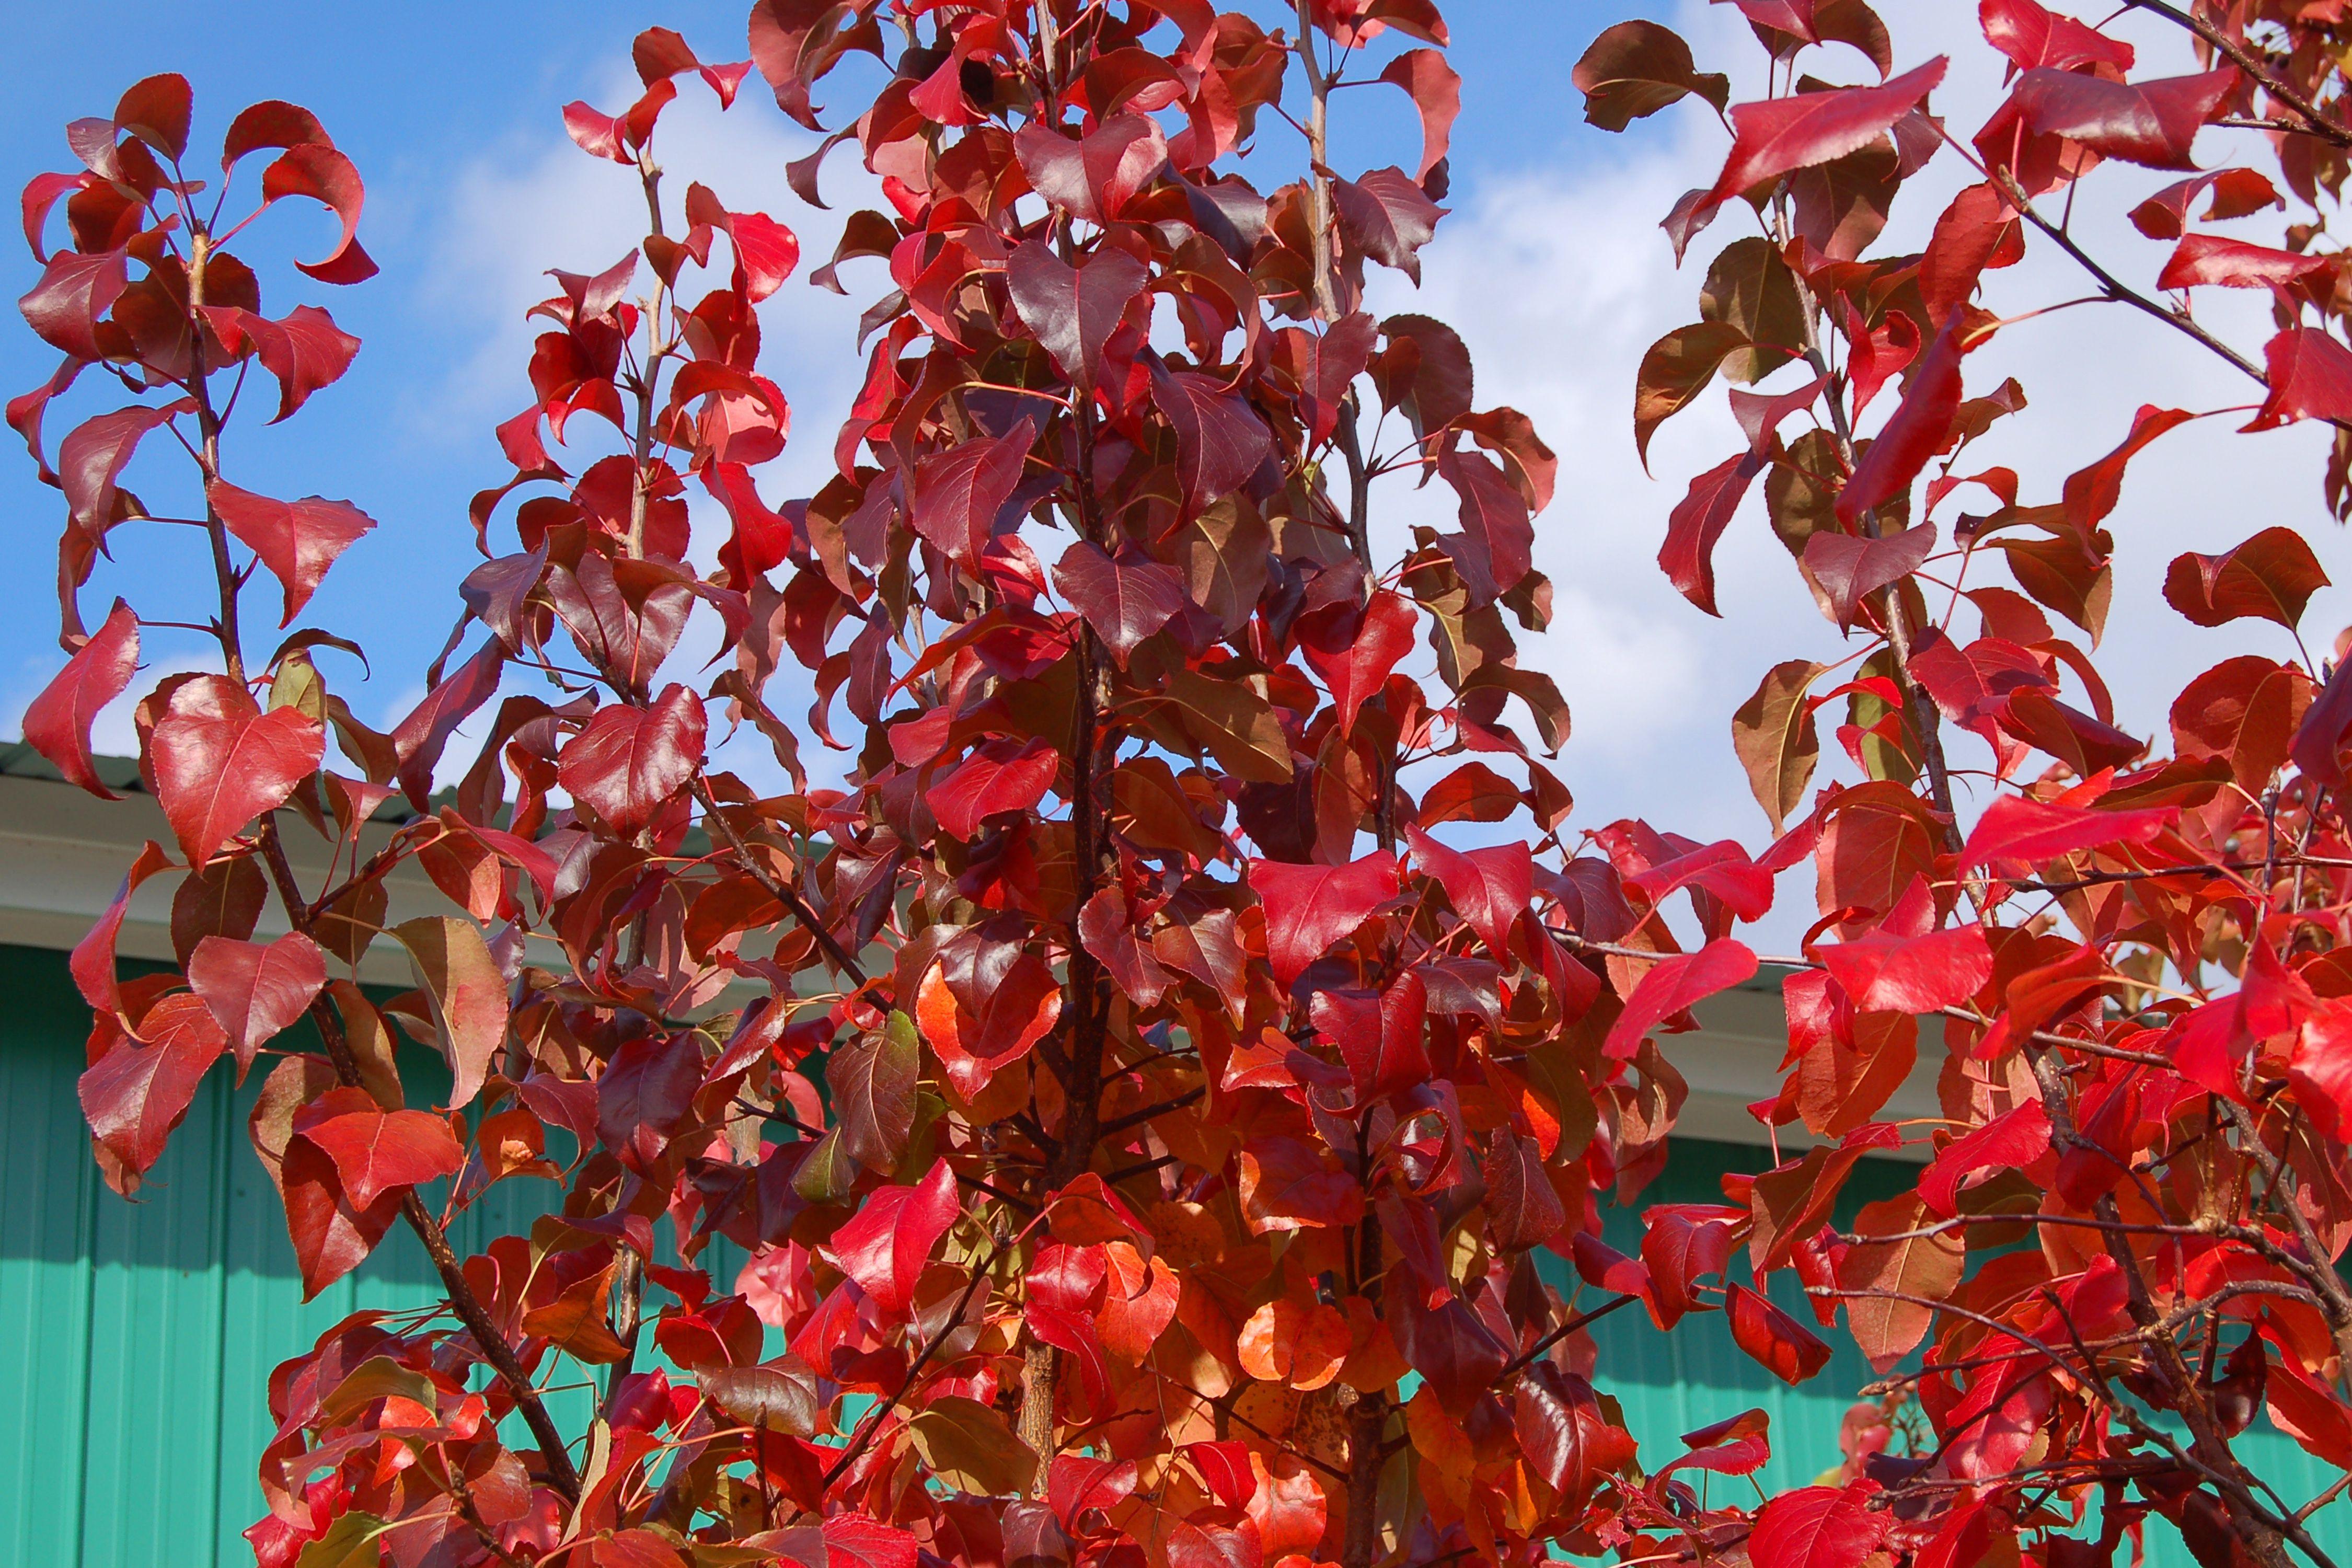 Pyrus calleryana Autumn blaze tree